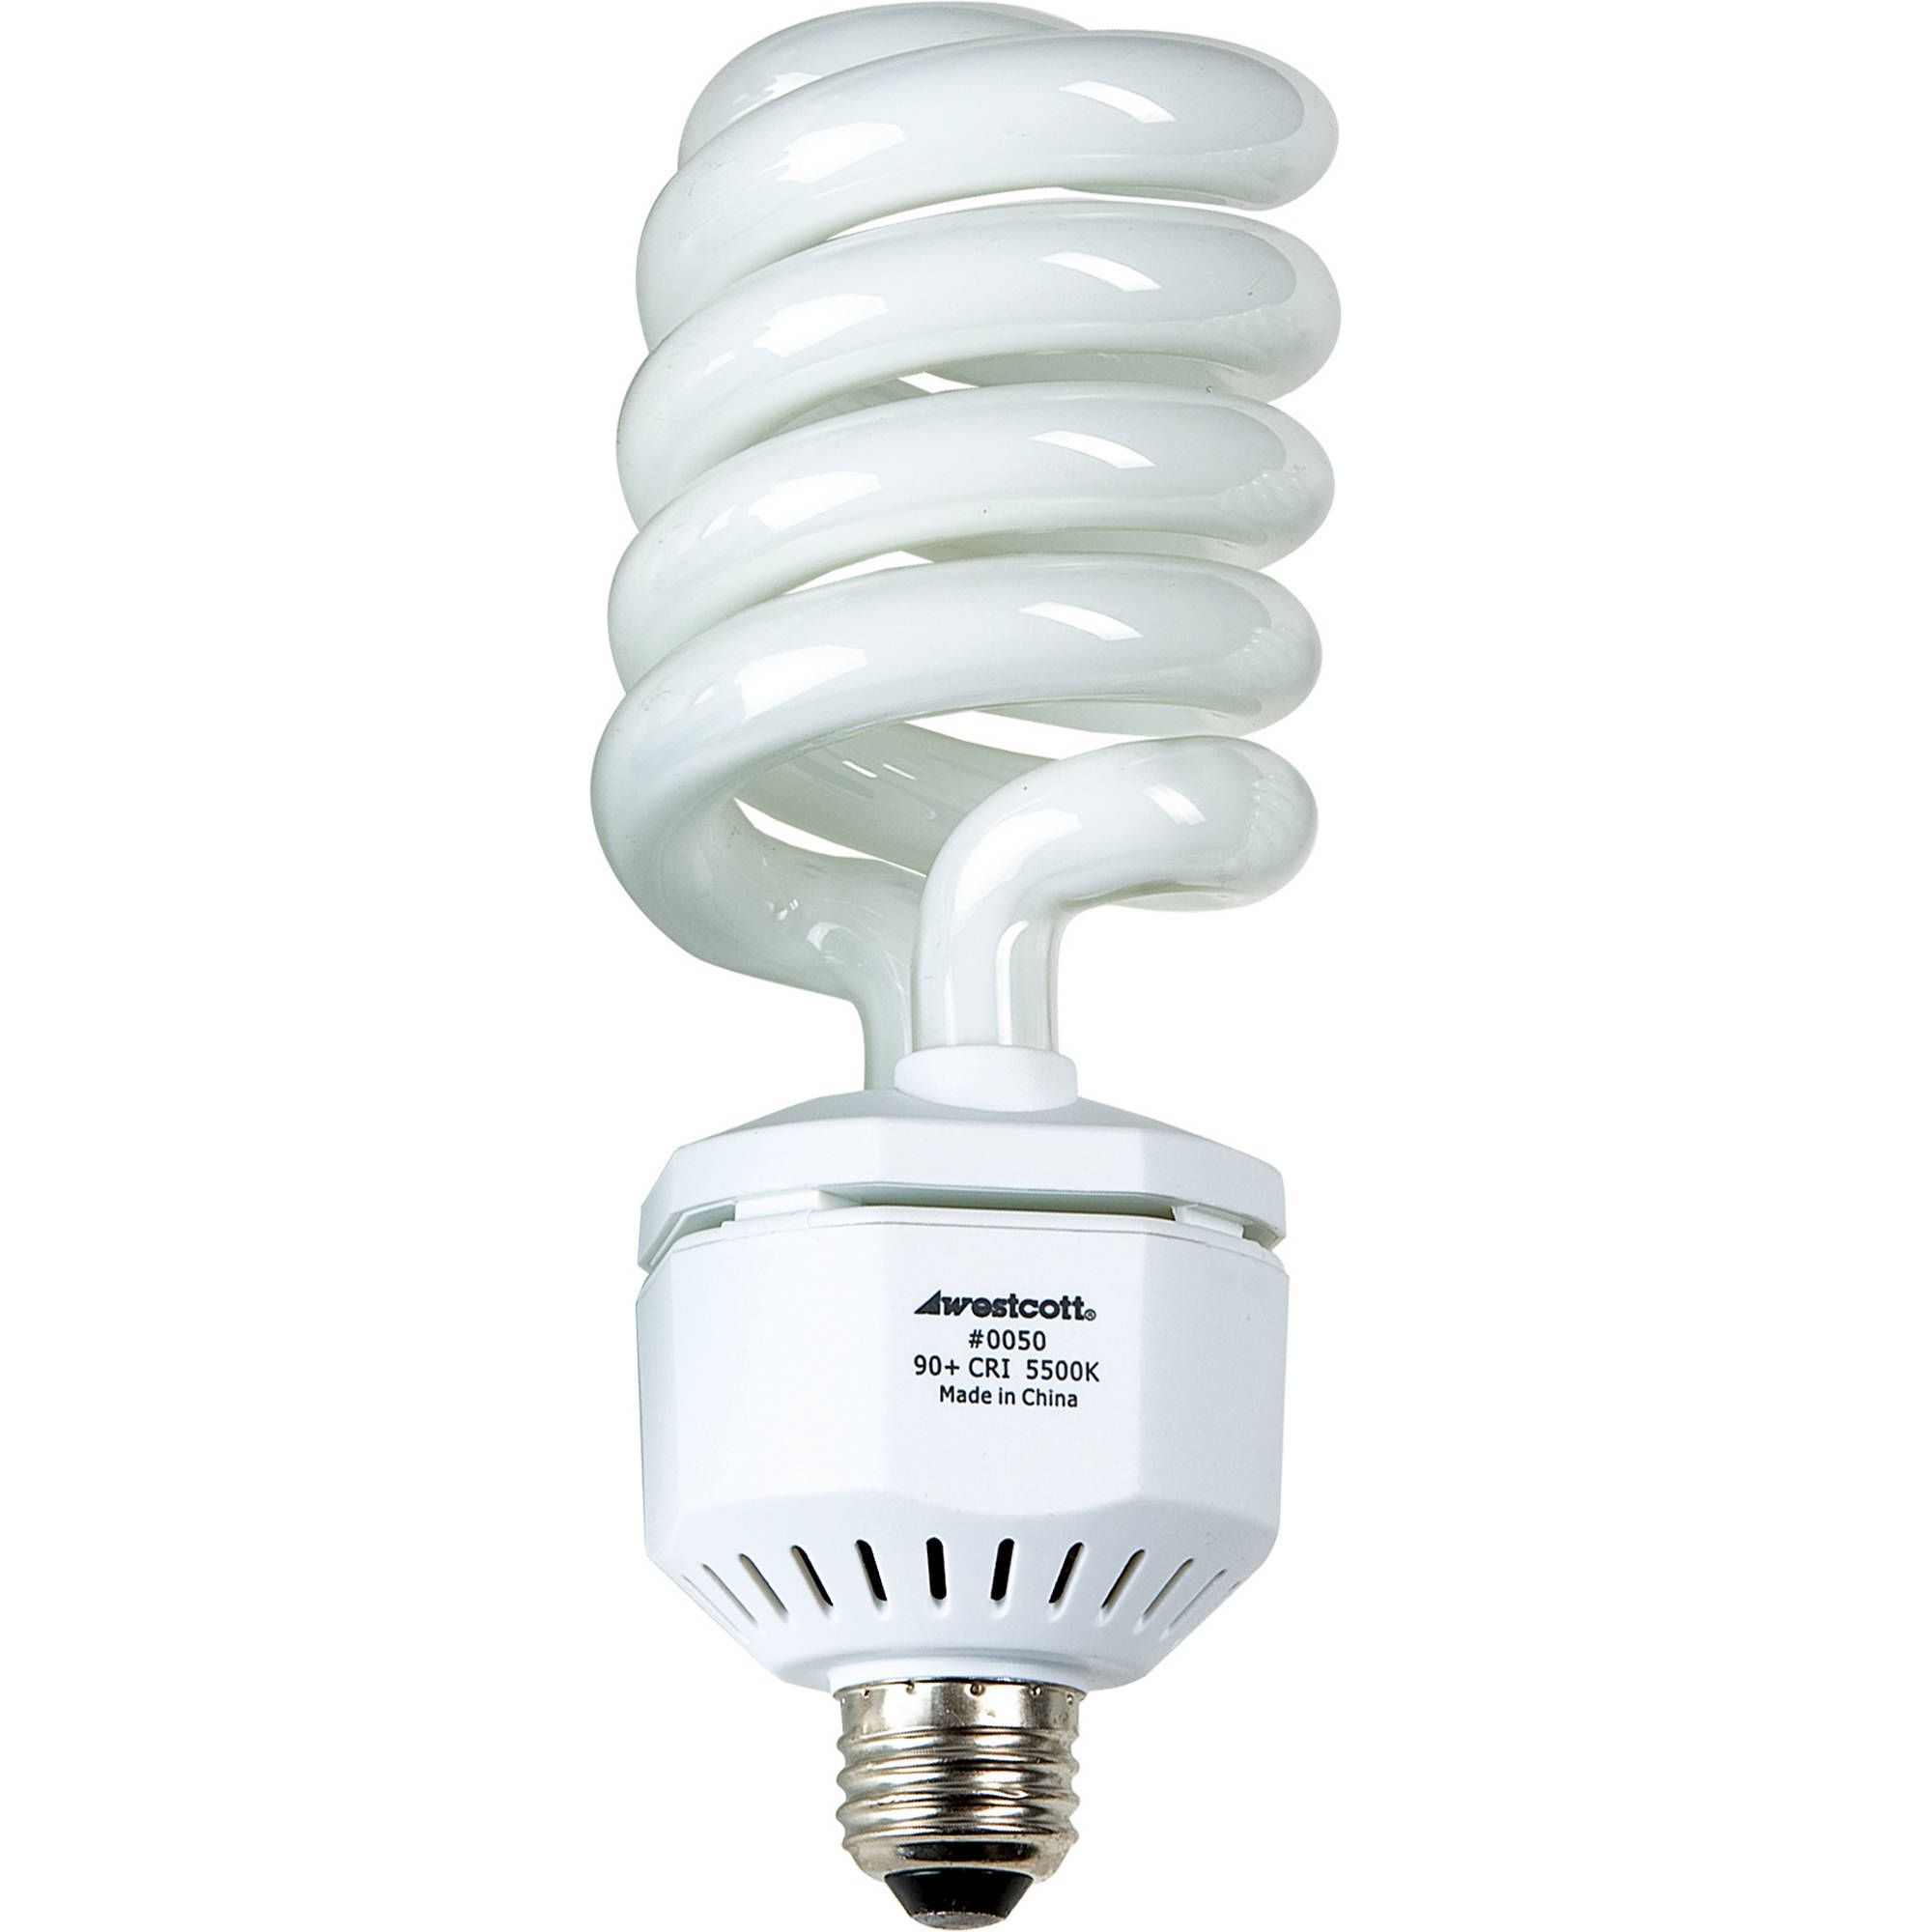 Fluorescent Light Bulbs Wattage | Http://johncow.us | Pinterest | Light  Bulb Wattage, Light Bulb And Bulbs